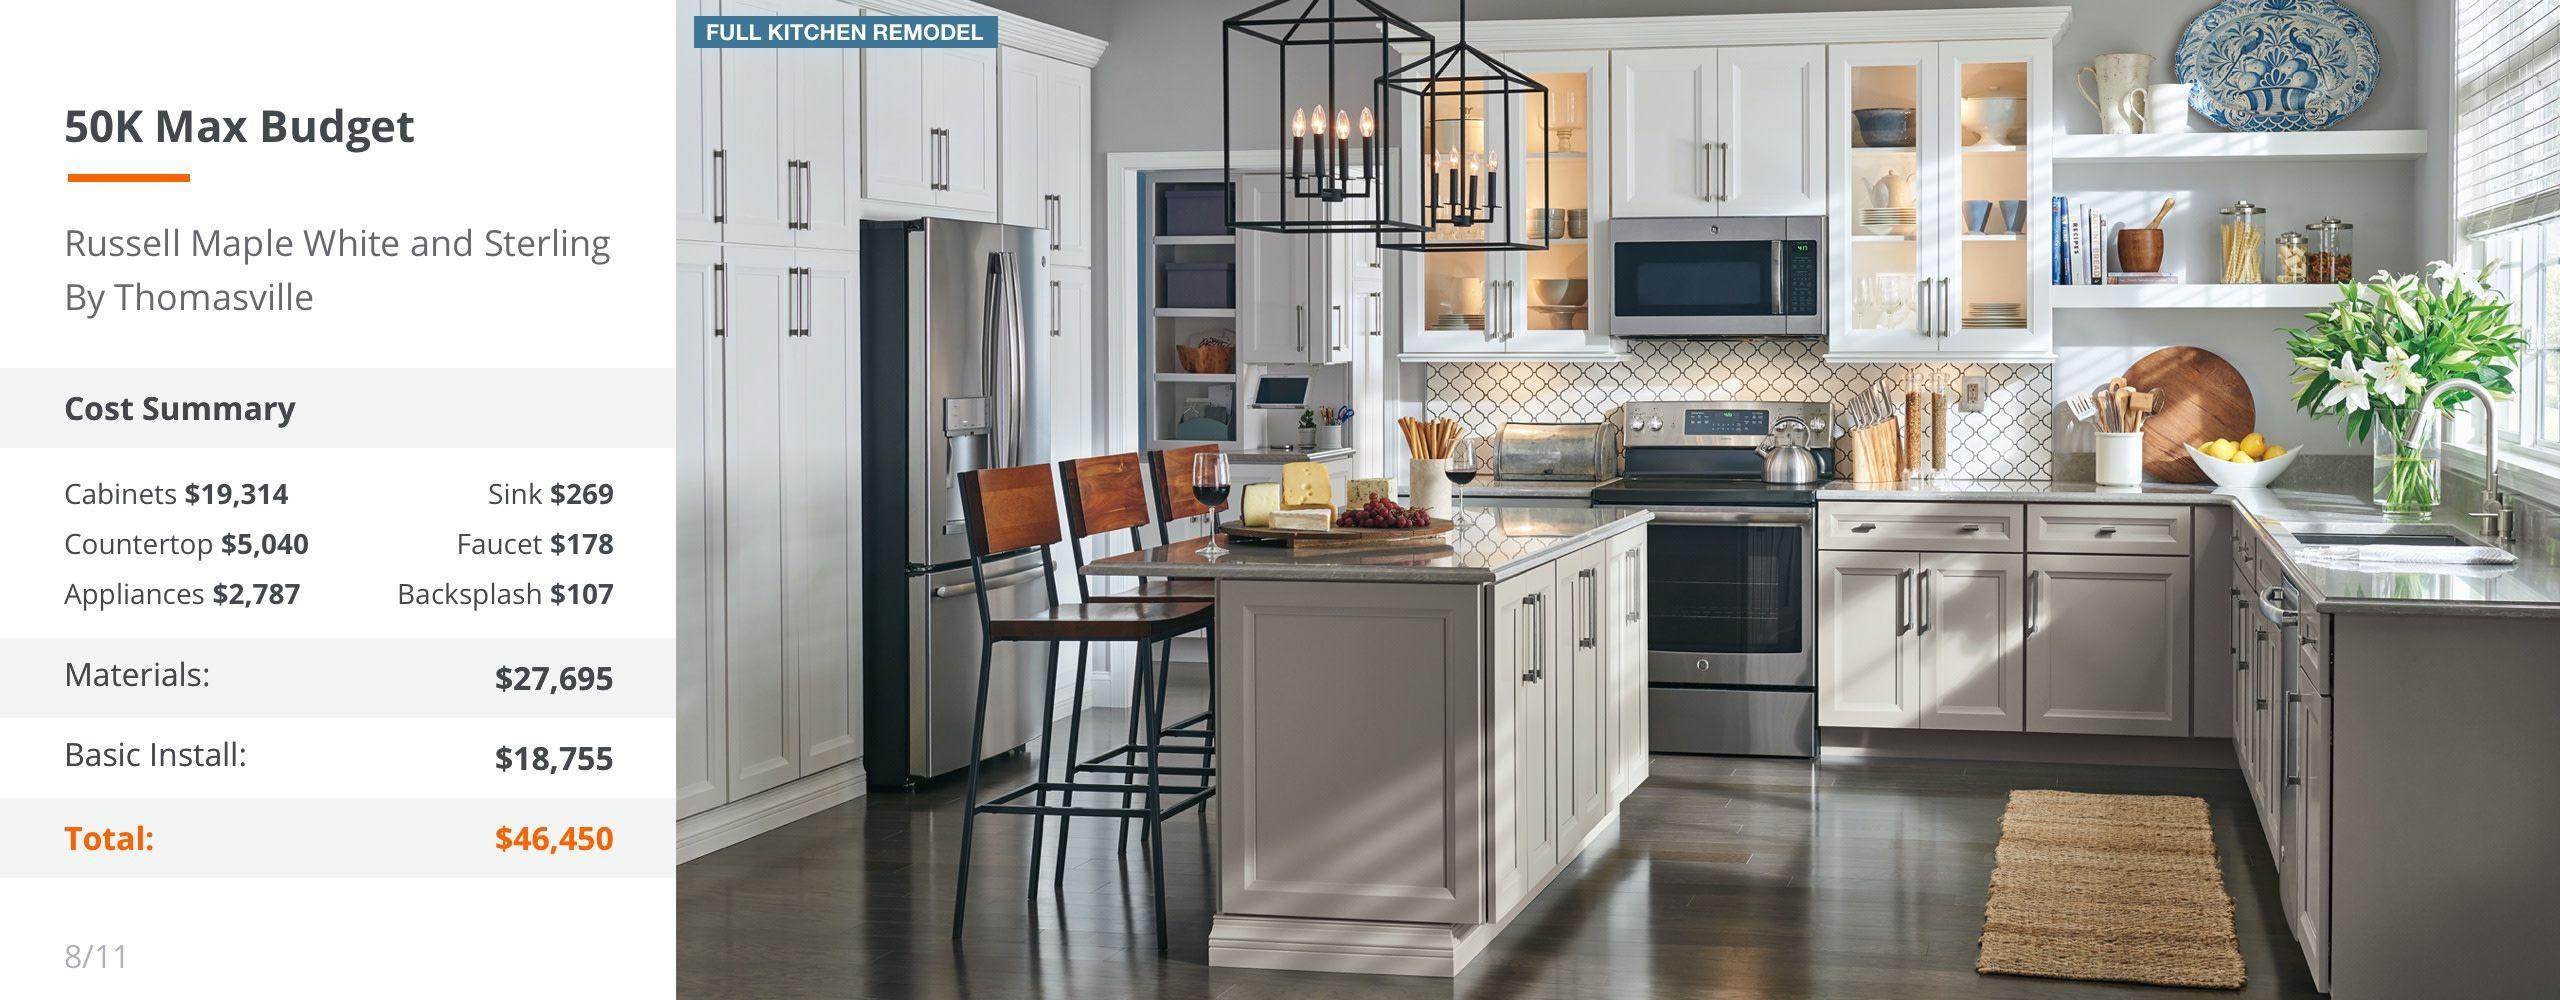 50k Max Budget Gray Desktop Kitchen Inspiration Design Kitchen Design Custom Countertops